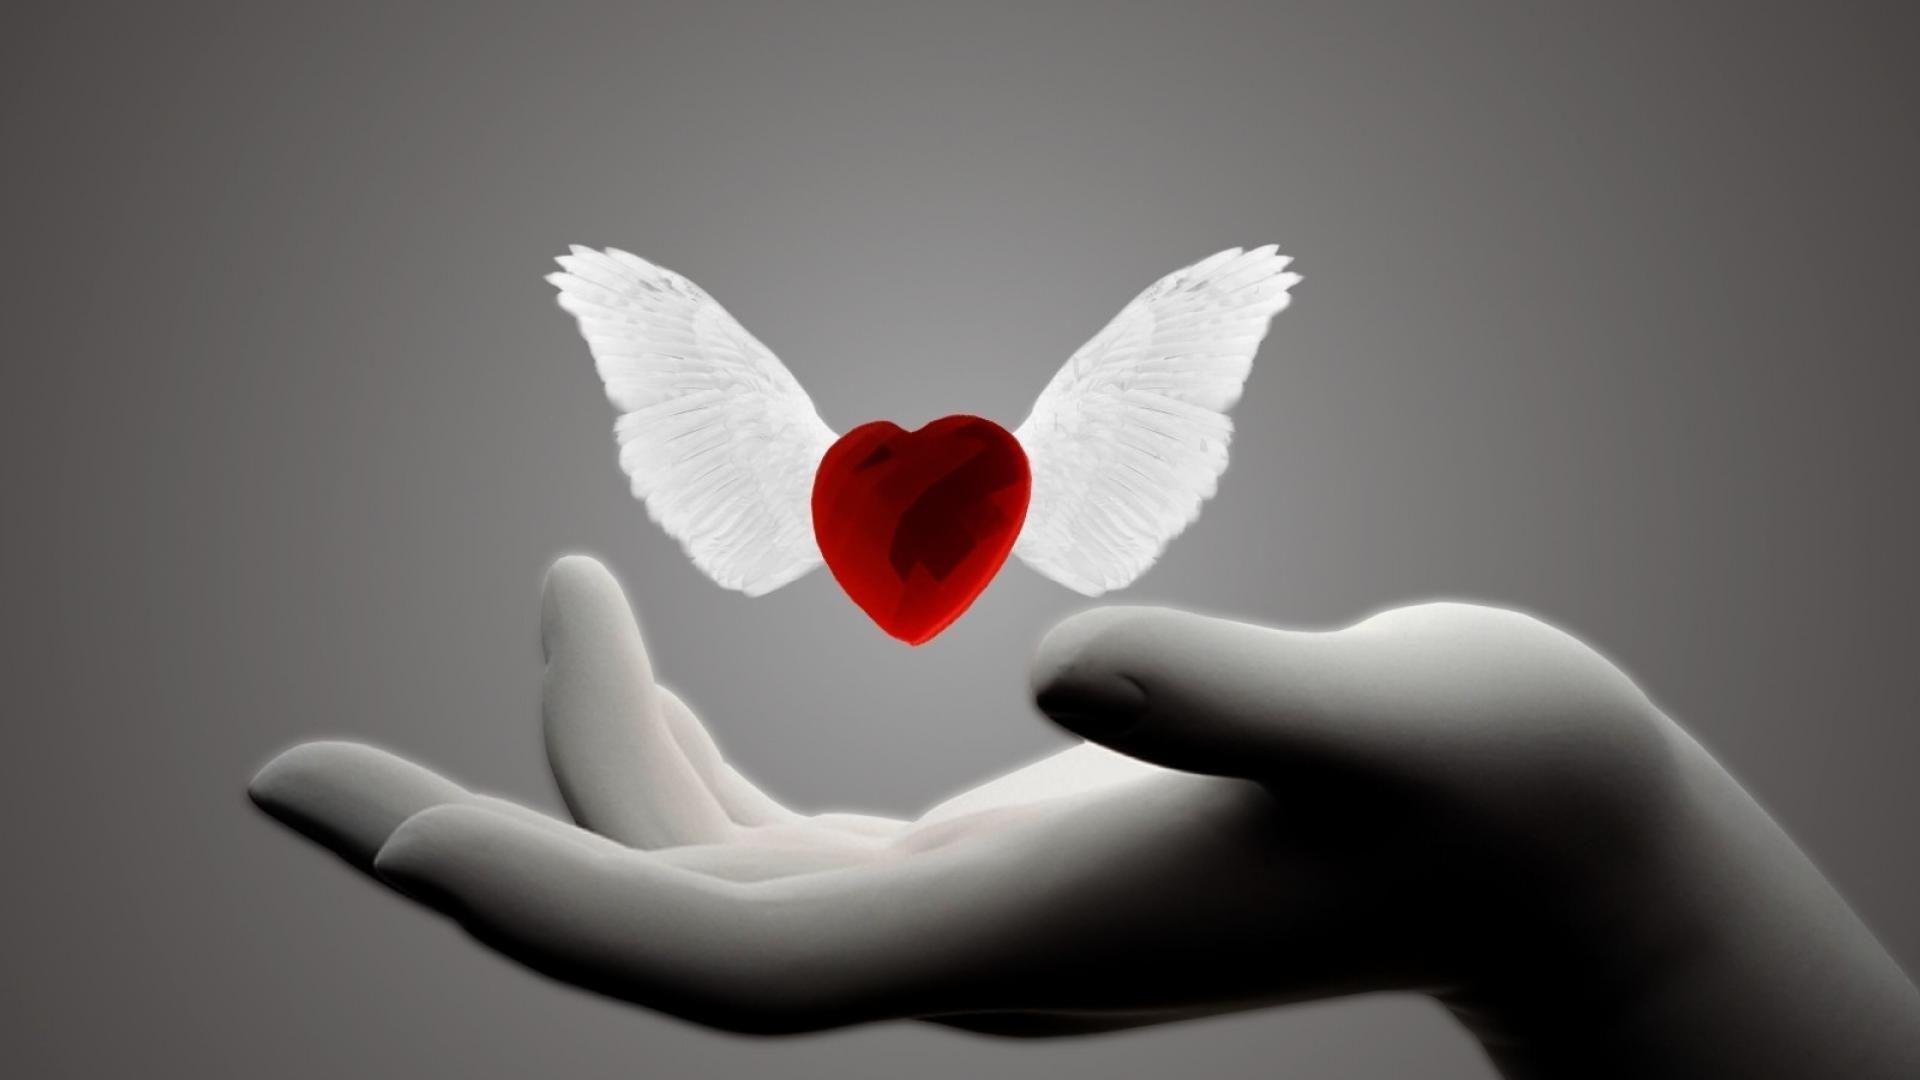 Loving Heart Background Wallpaper Hd New Wallpaper Hd Love